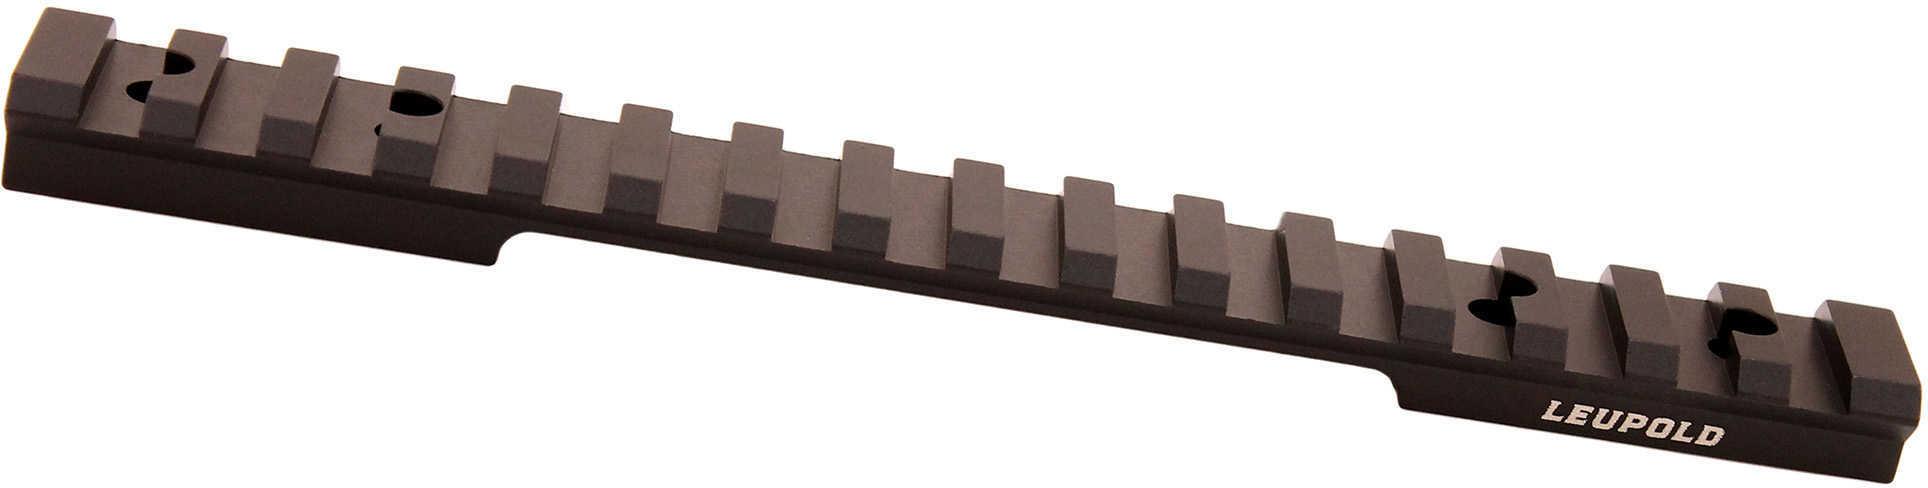 Leupold BackCountry Cross-Slot 1 Piece Base Ruger® American, Short Action, 20 MOA, Matte Black Md: 171359